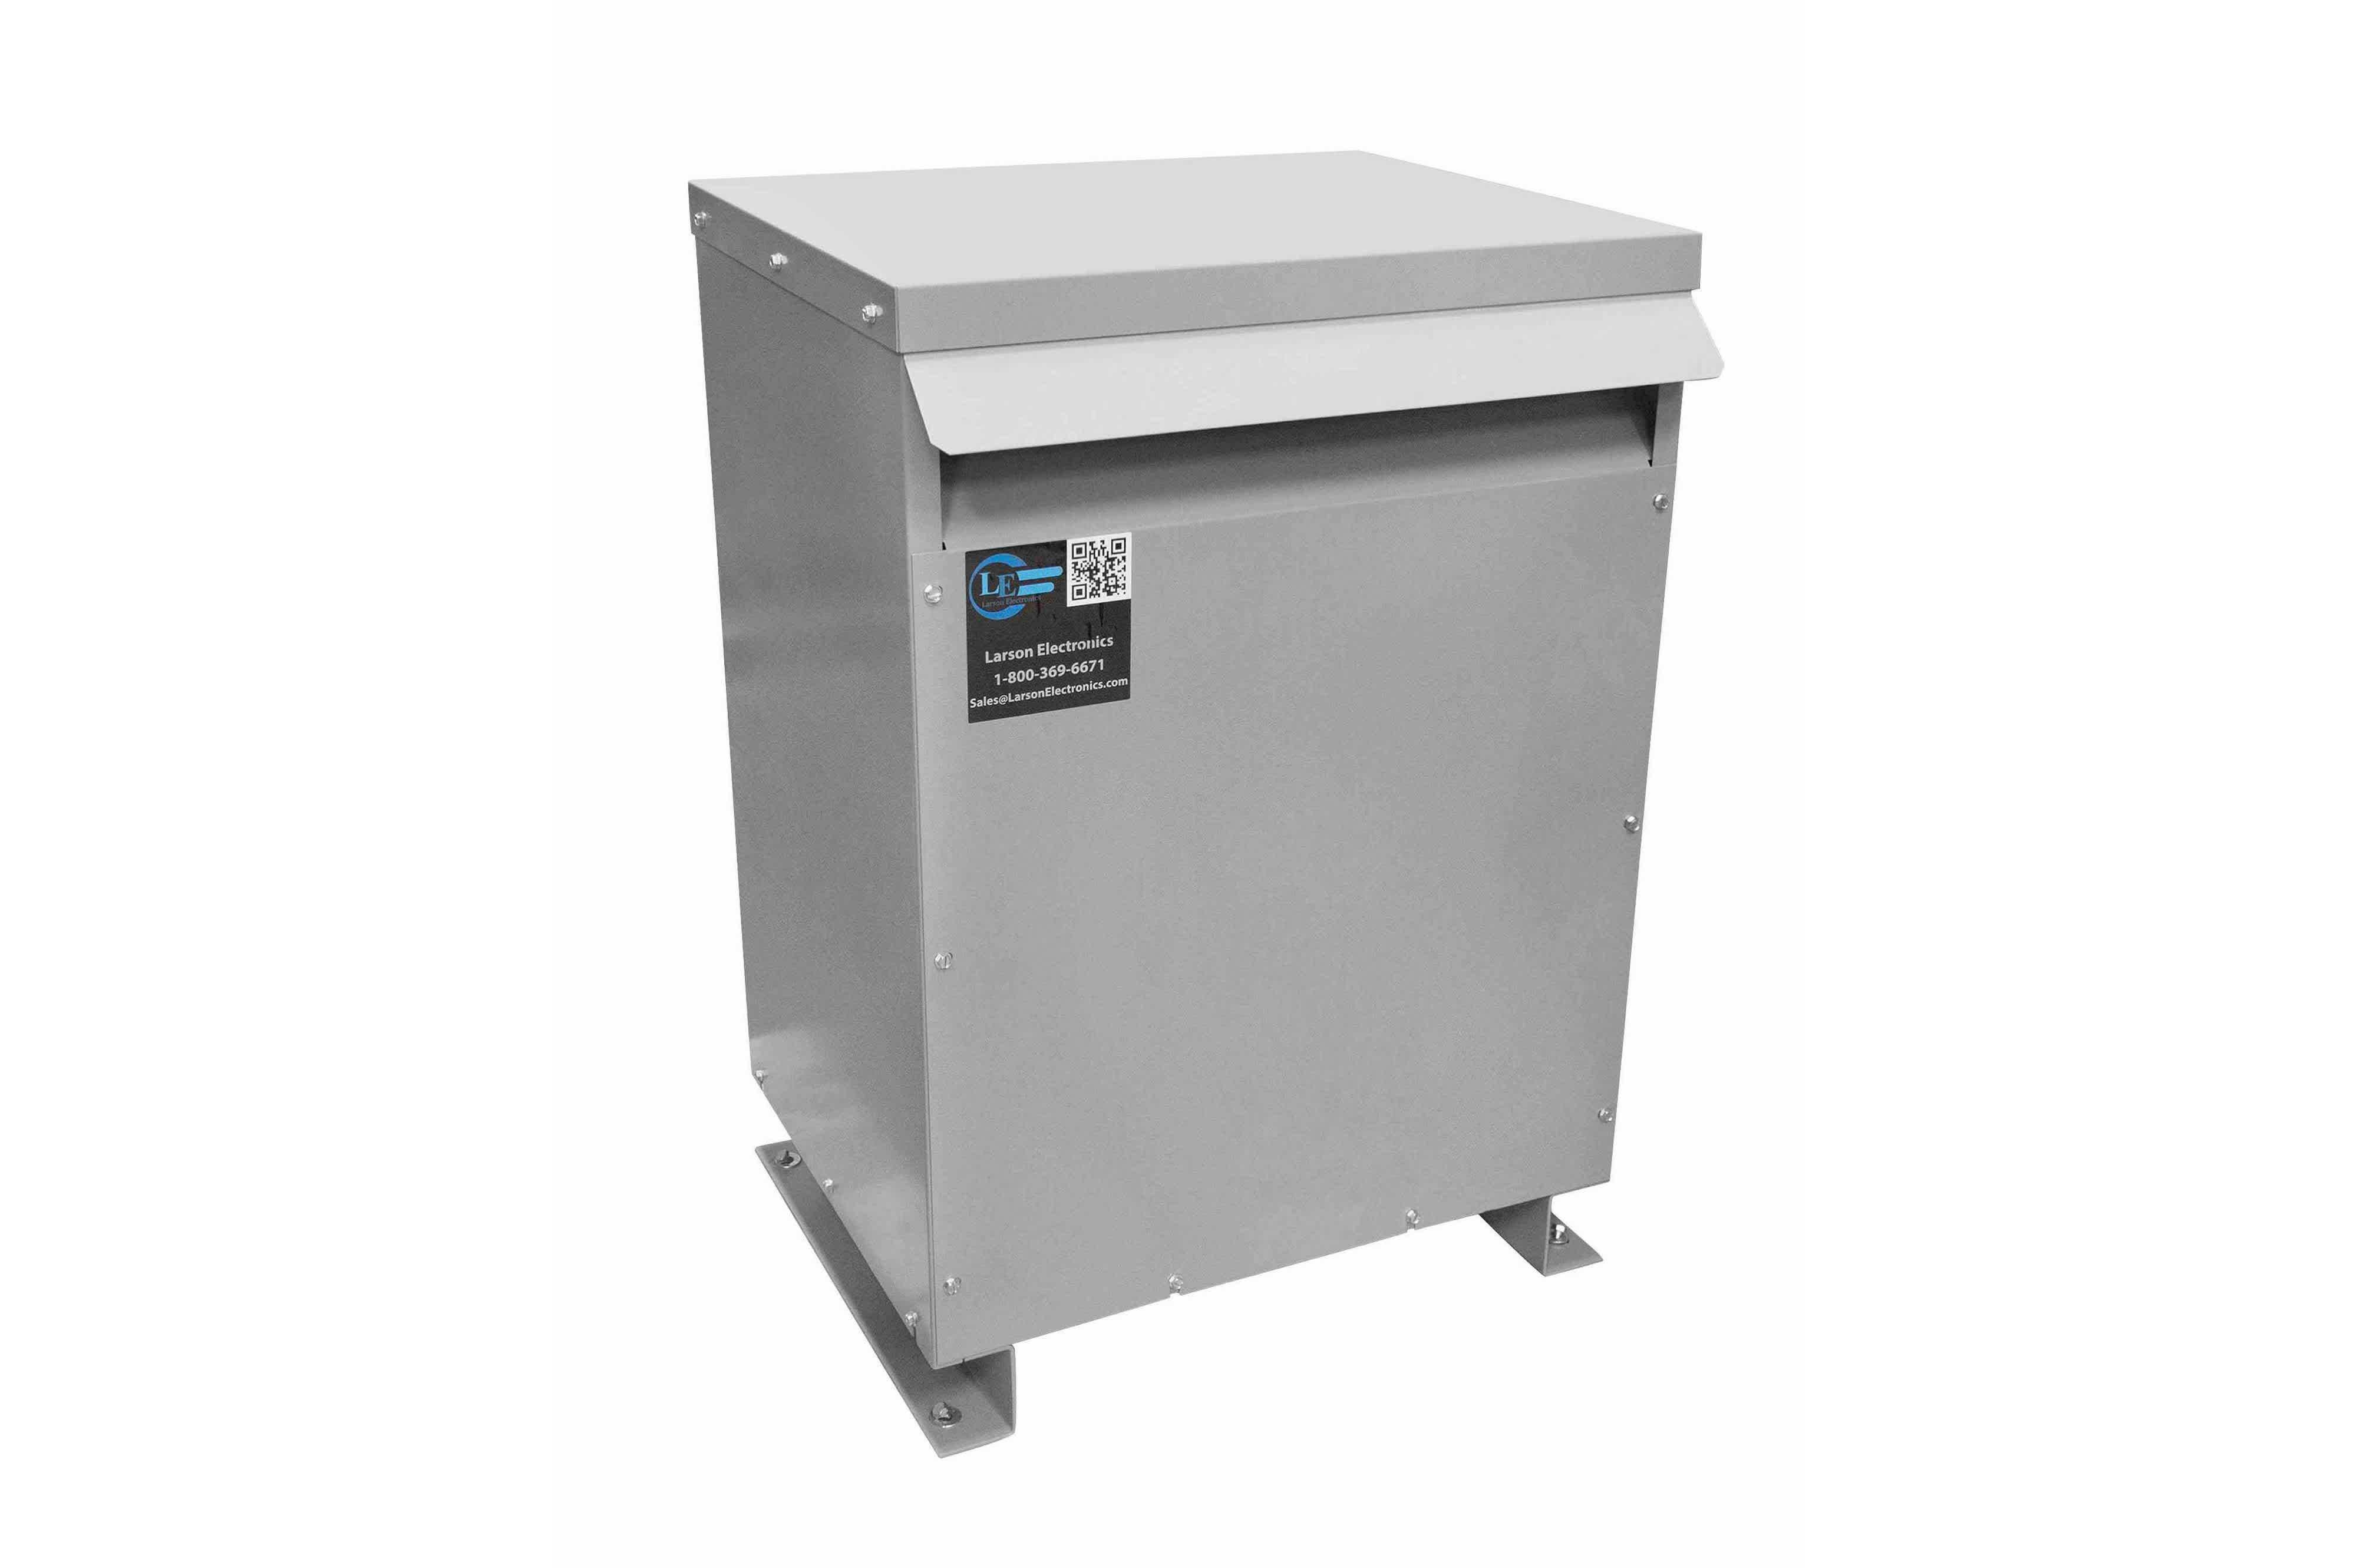 35 kVA 3PH Isolation Transformer, 400V Wye Primary, 208V Delta Secondary, N3R, Ventilated, 60 Hz